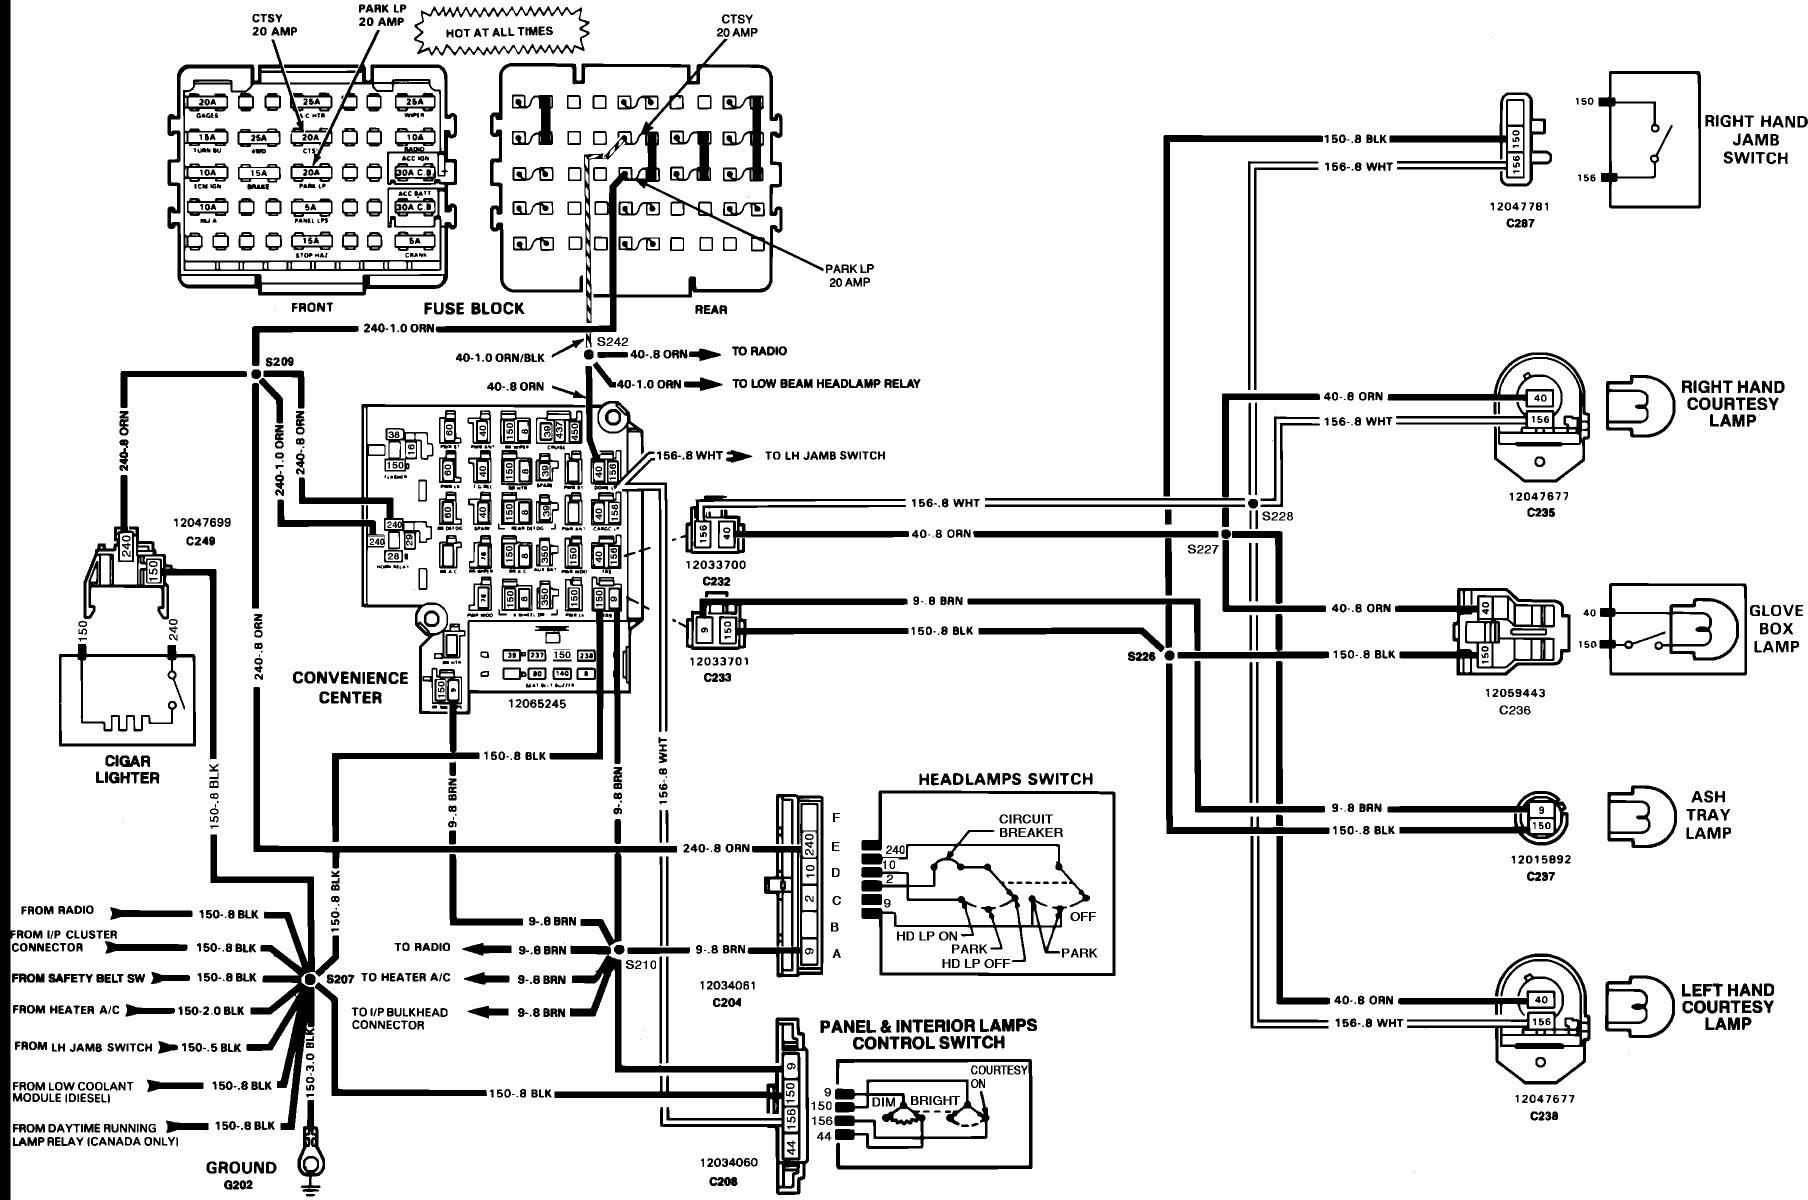 2002 Prizm Instrument Cluster Wiring Diagrams 1996 Ford Truck Wiring Schematics Tomberlins Pujaan Hati Jeanjaures37 Fr